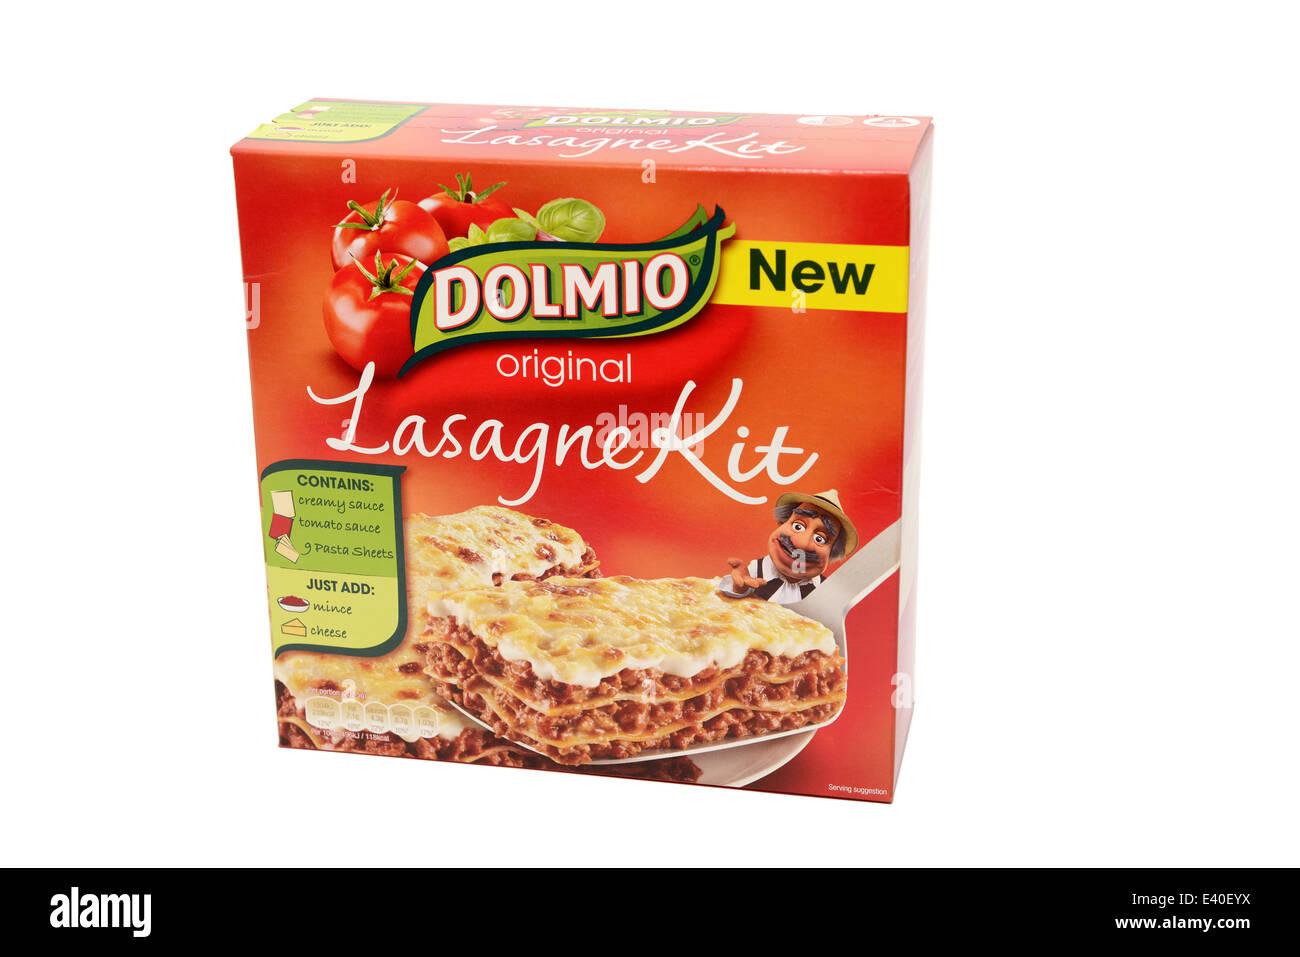 Dolmio Lasagne Kit - Stock Image